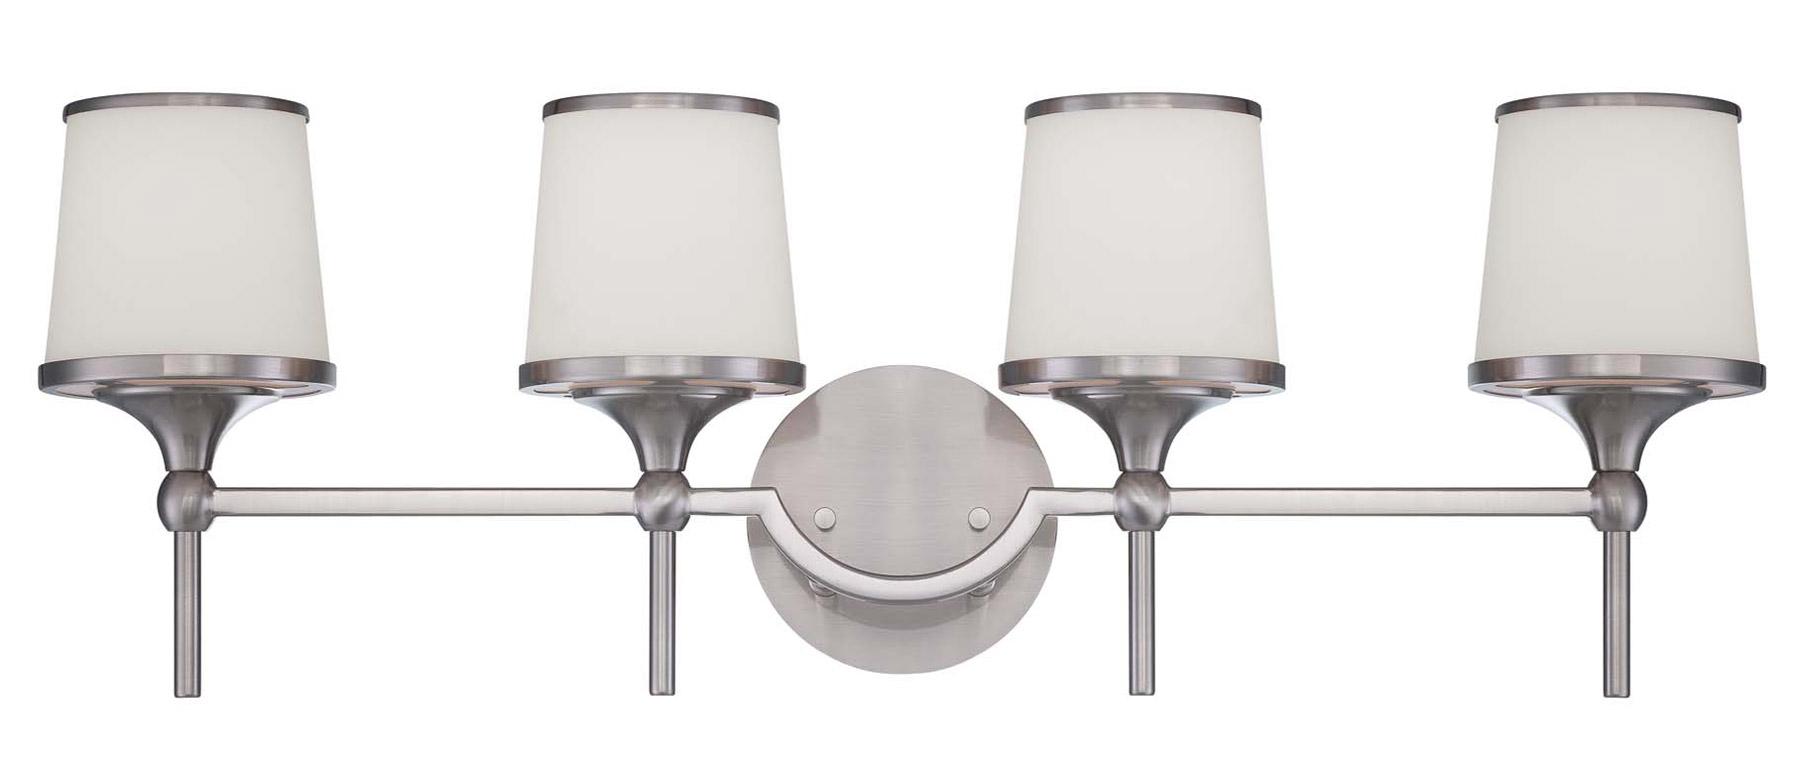 Savoy house 8 4385 4 sn hagen vanity light for Savoy house bathroom lighting